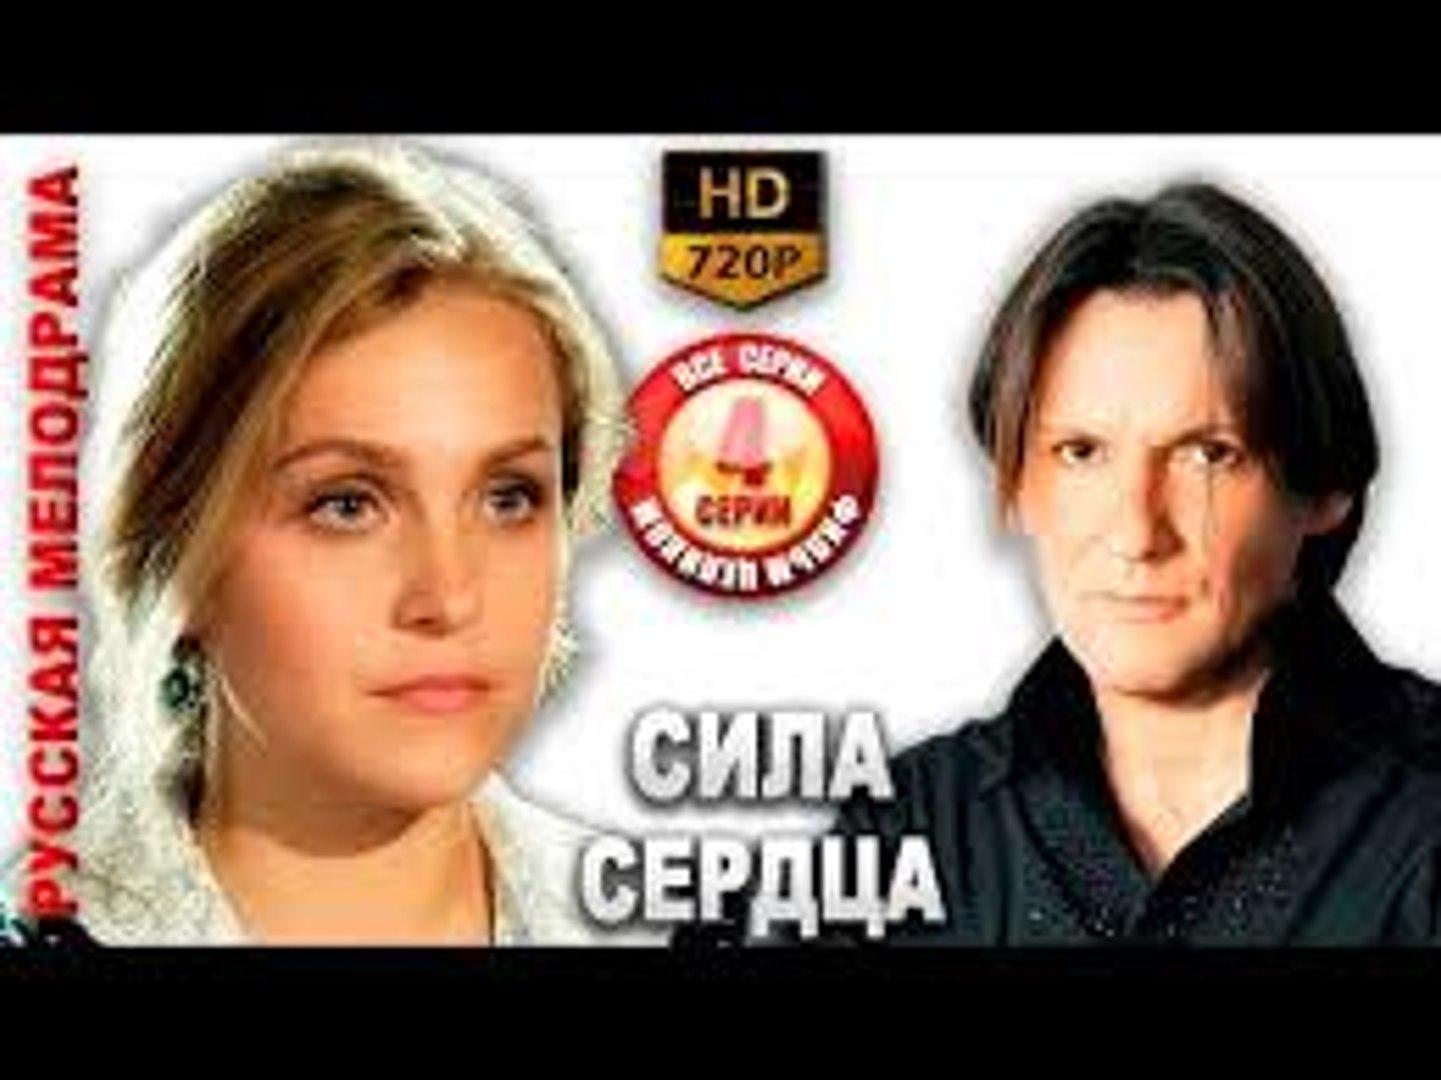 Сила сердца 1 2 3 4 серия 2017 русские мелодрамы 2017 russkie movie melodrami